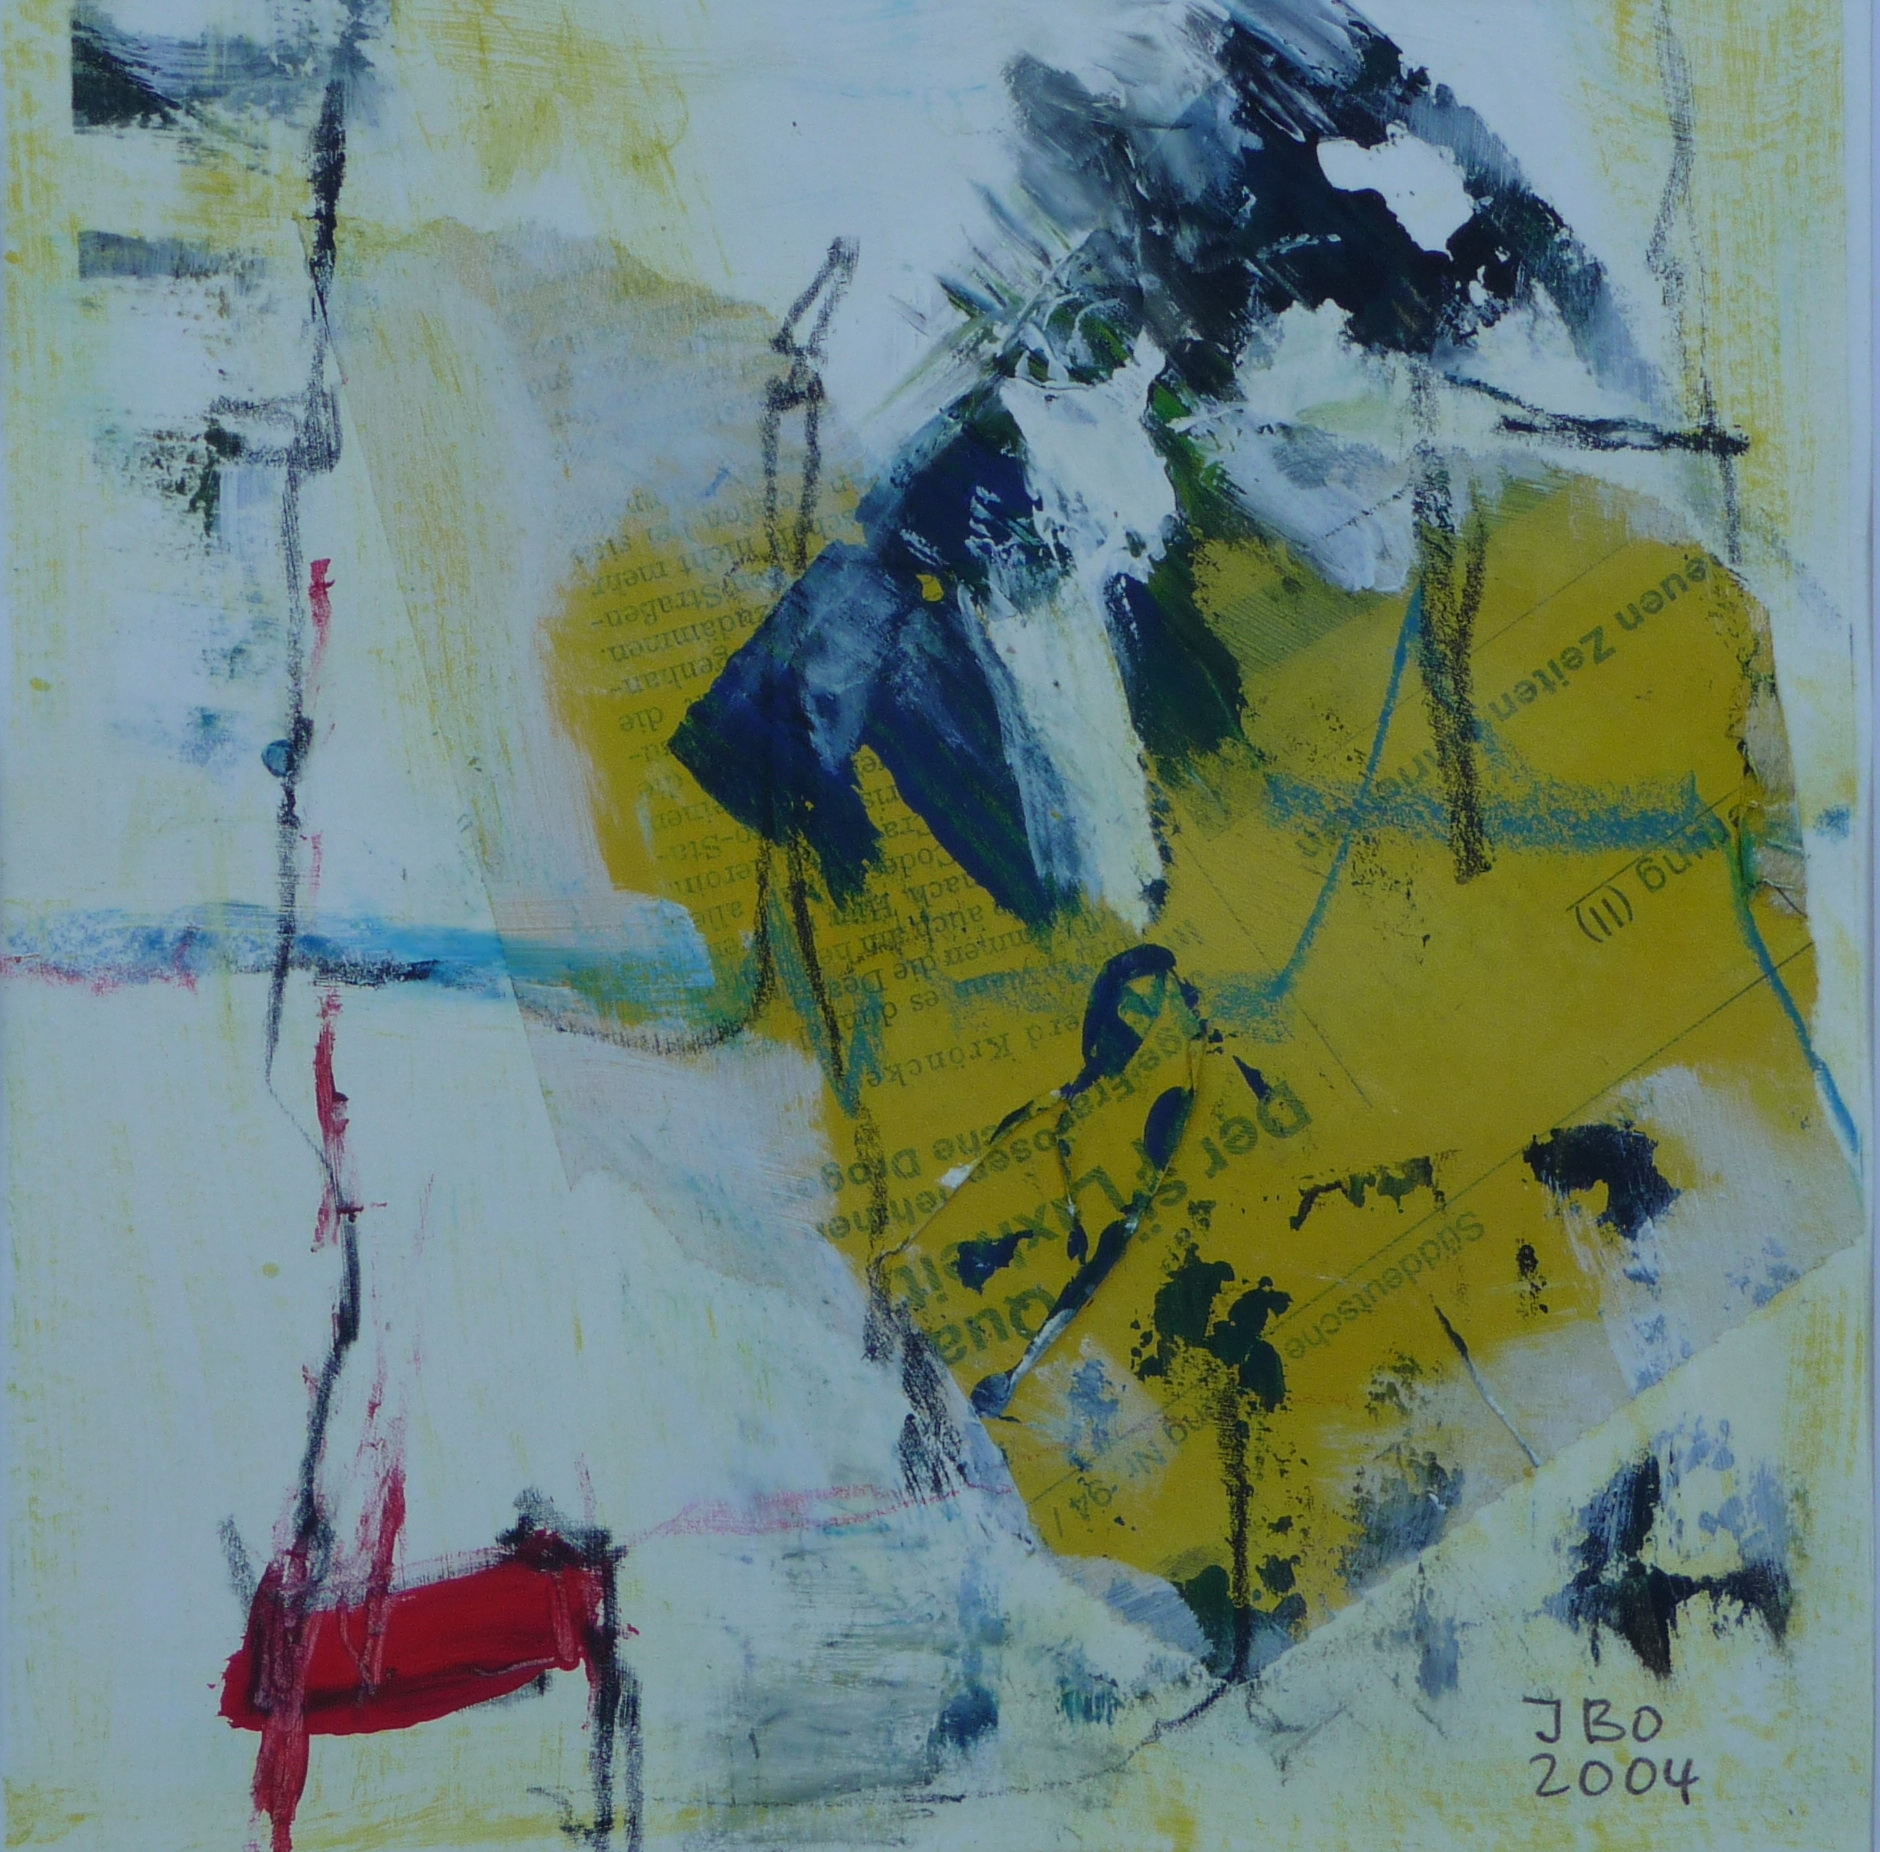 Spuren 1, 2004, Papier, 19x19